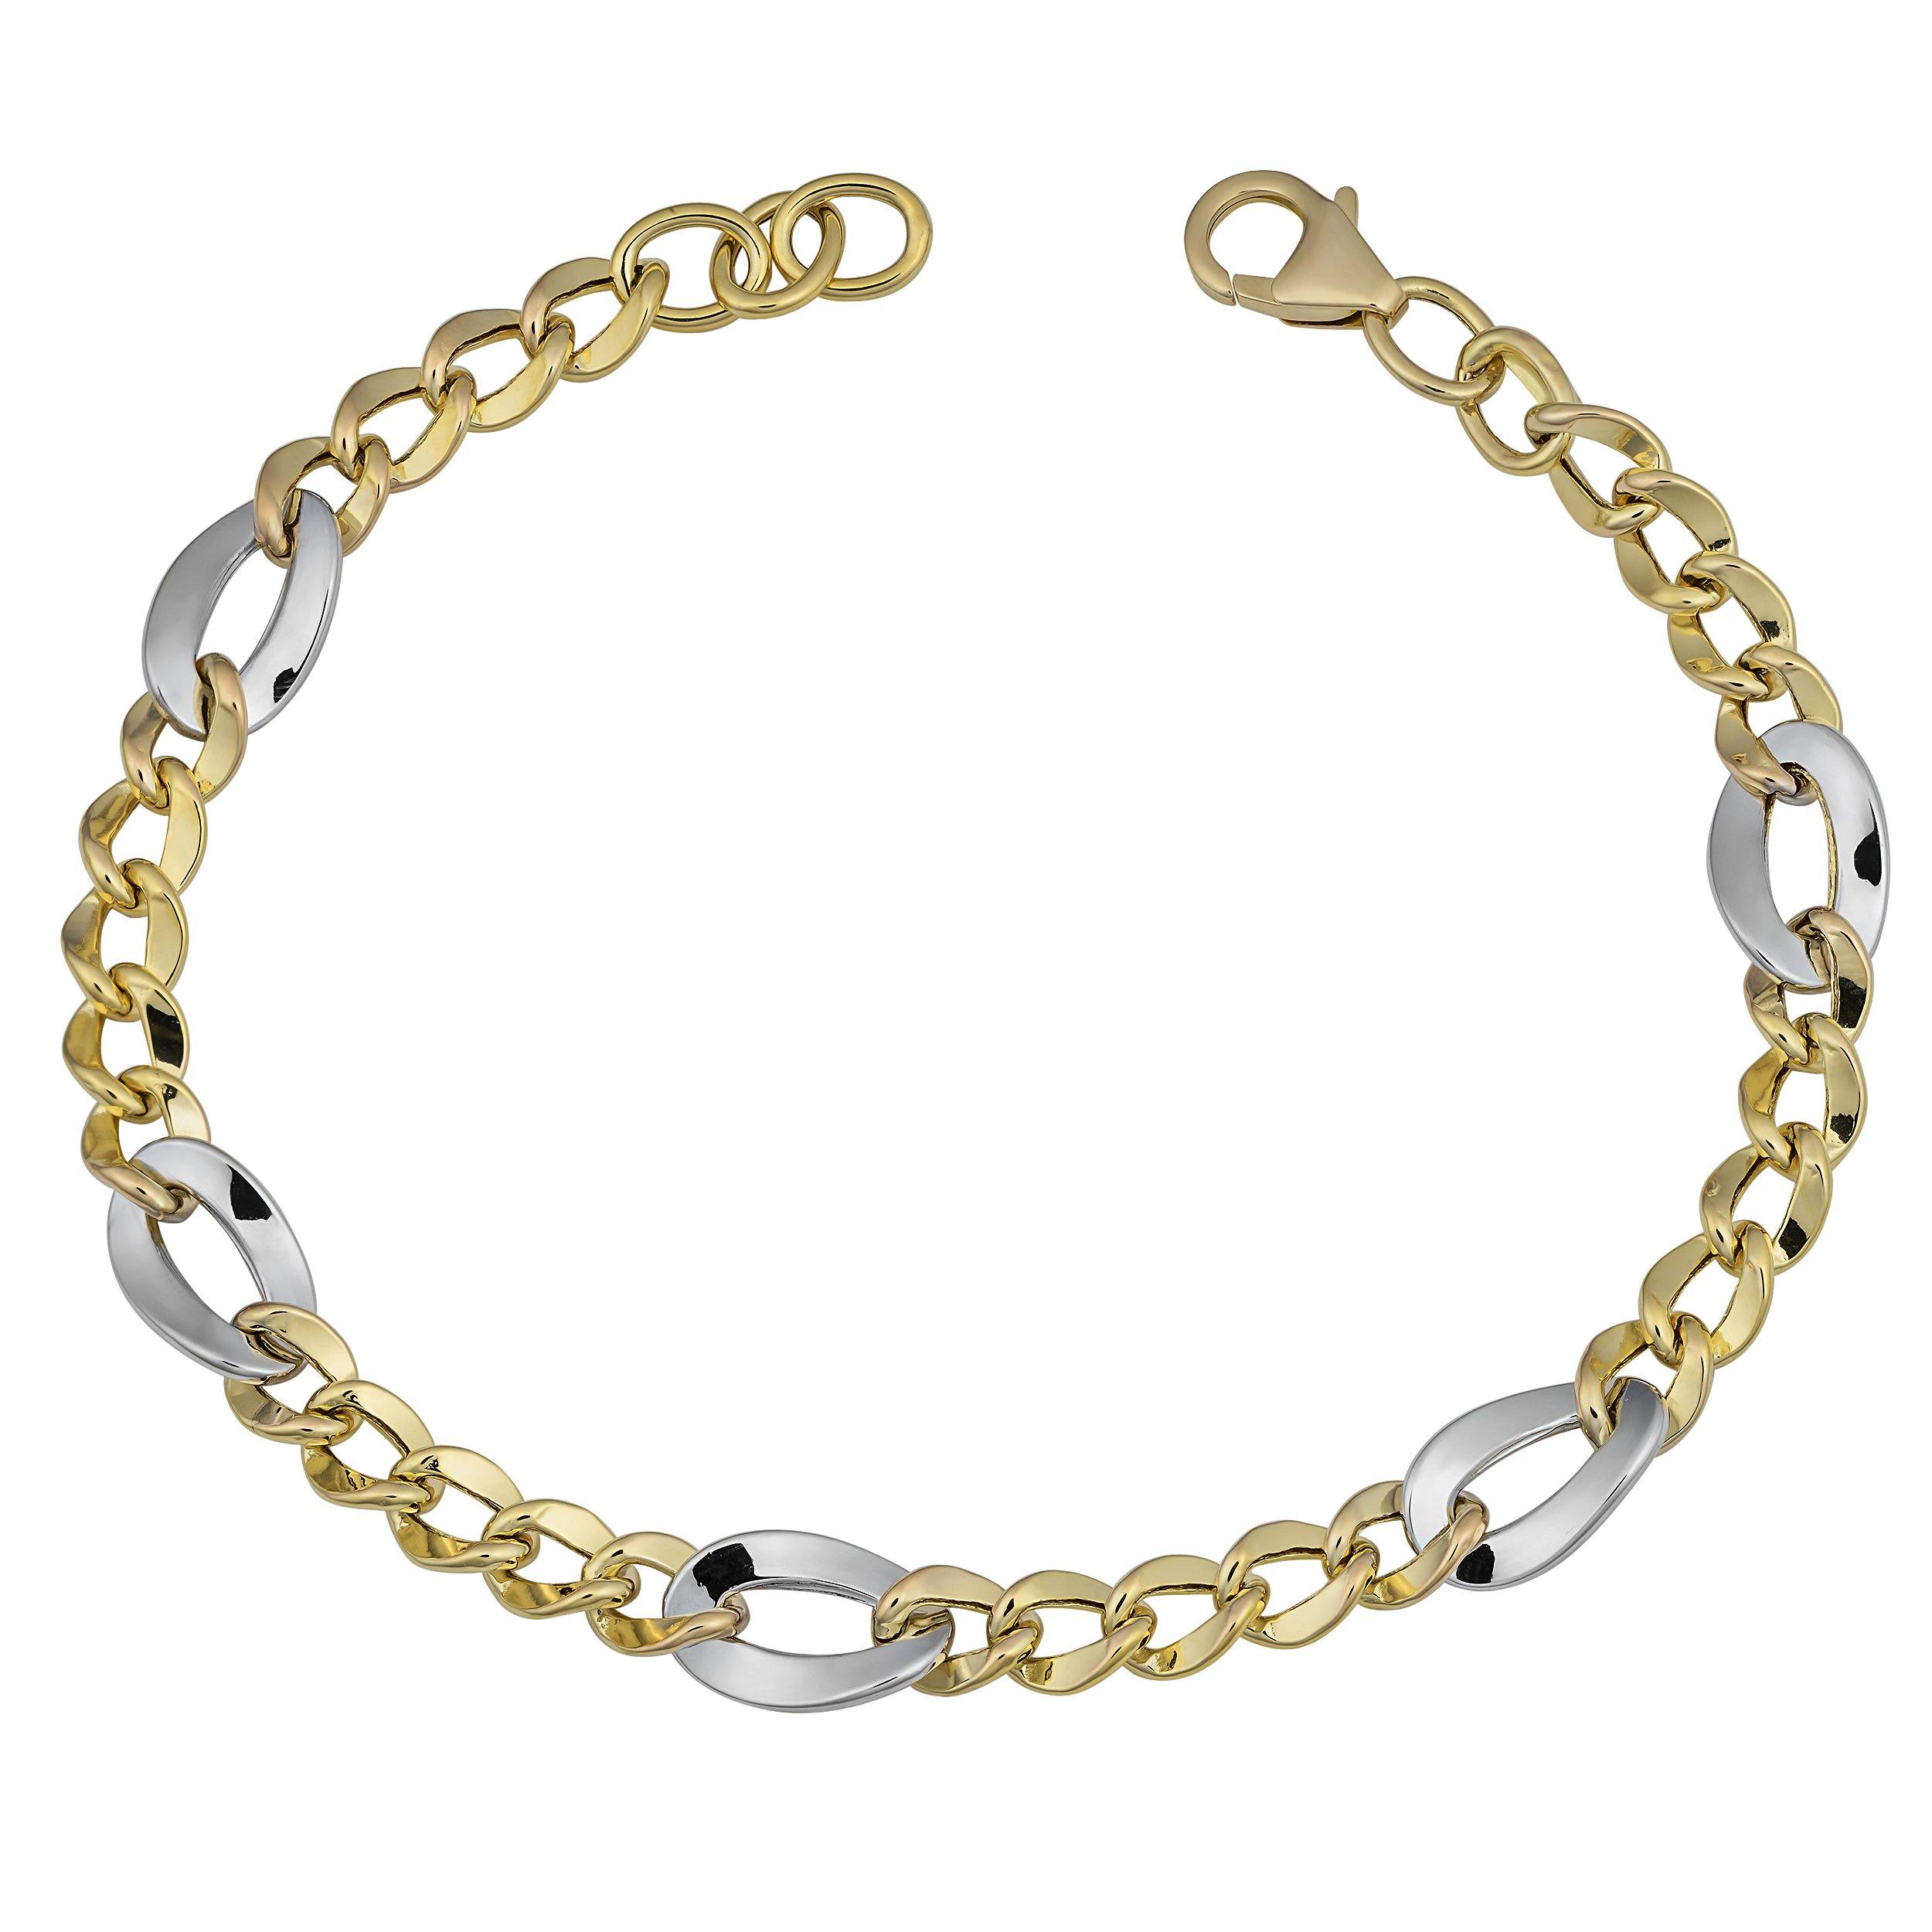 14k Two-Tone Gold Figaro Adjustable Length Bracelet (fits 7'' to 8'')